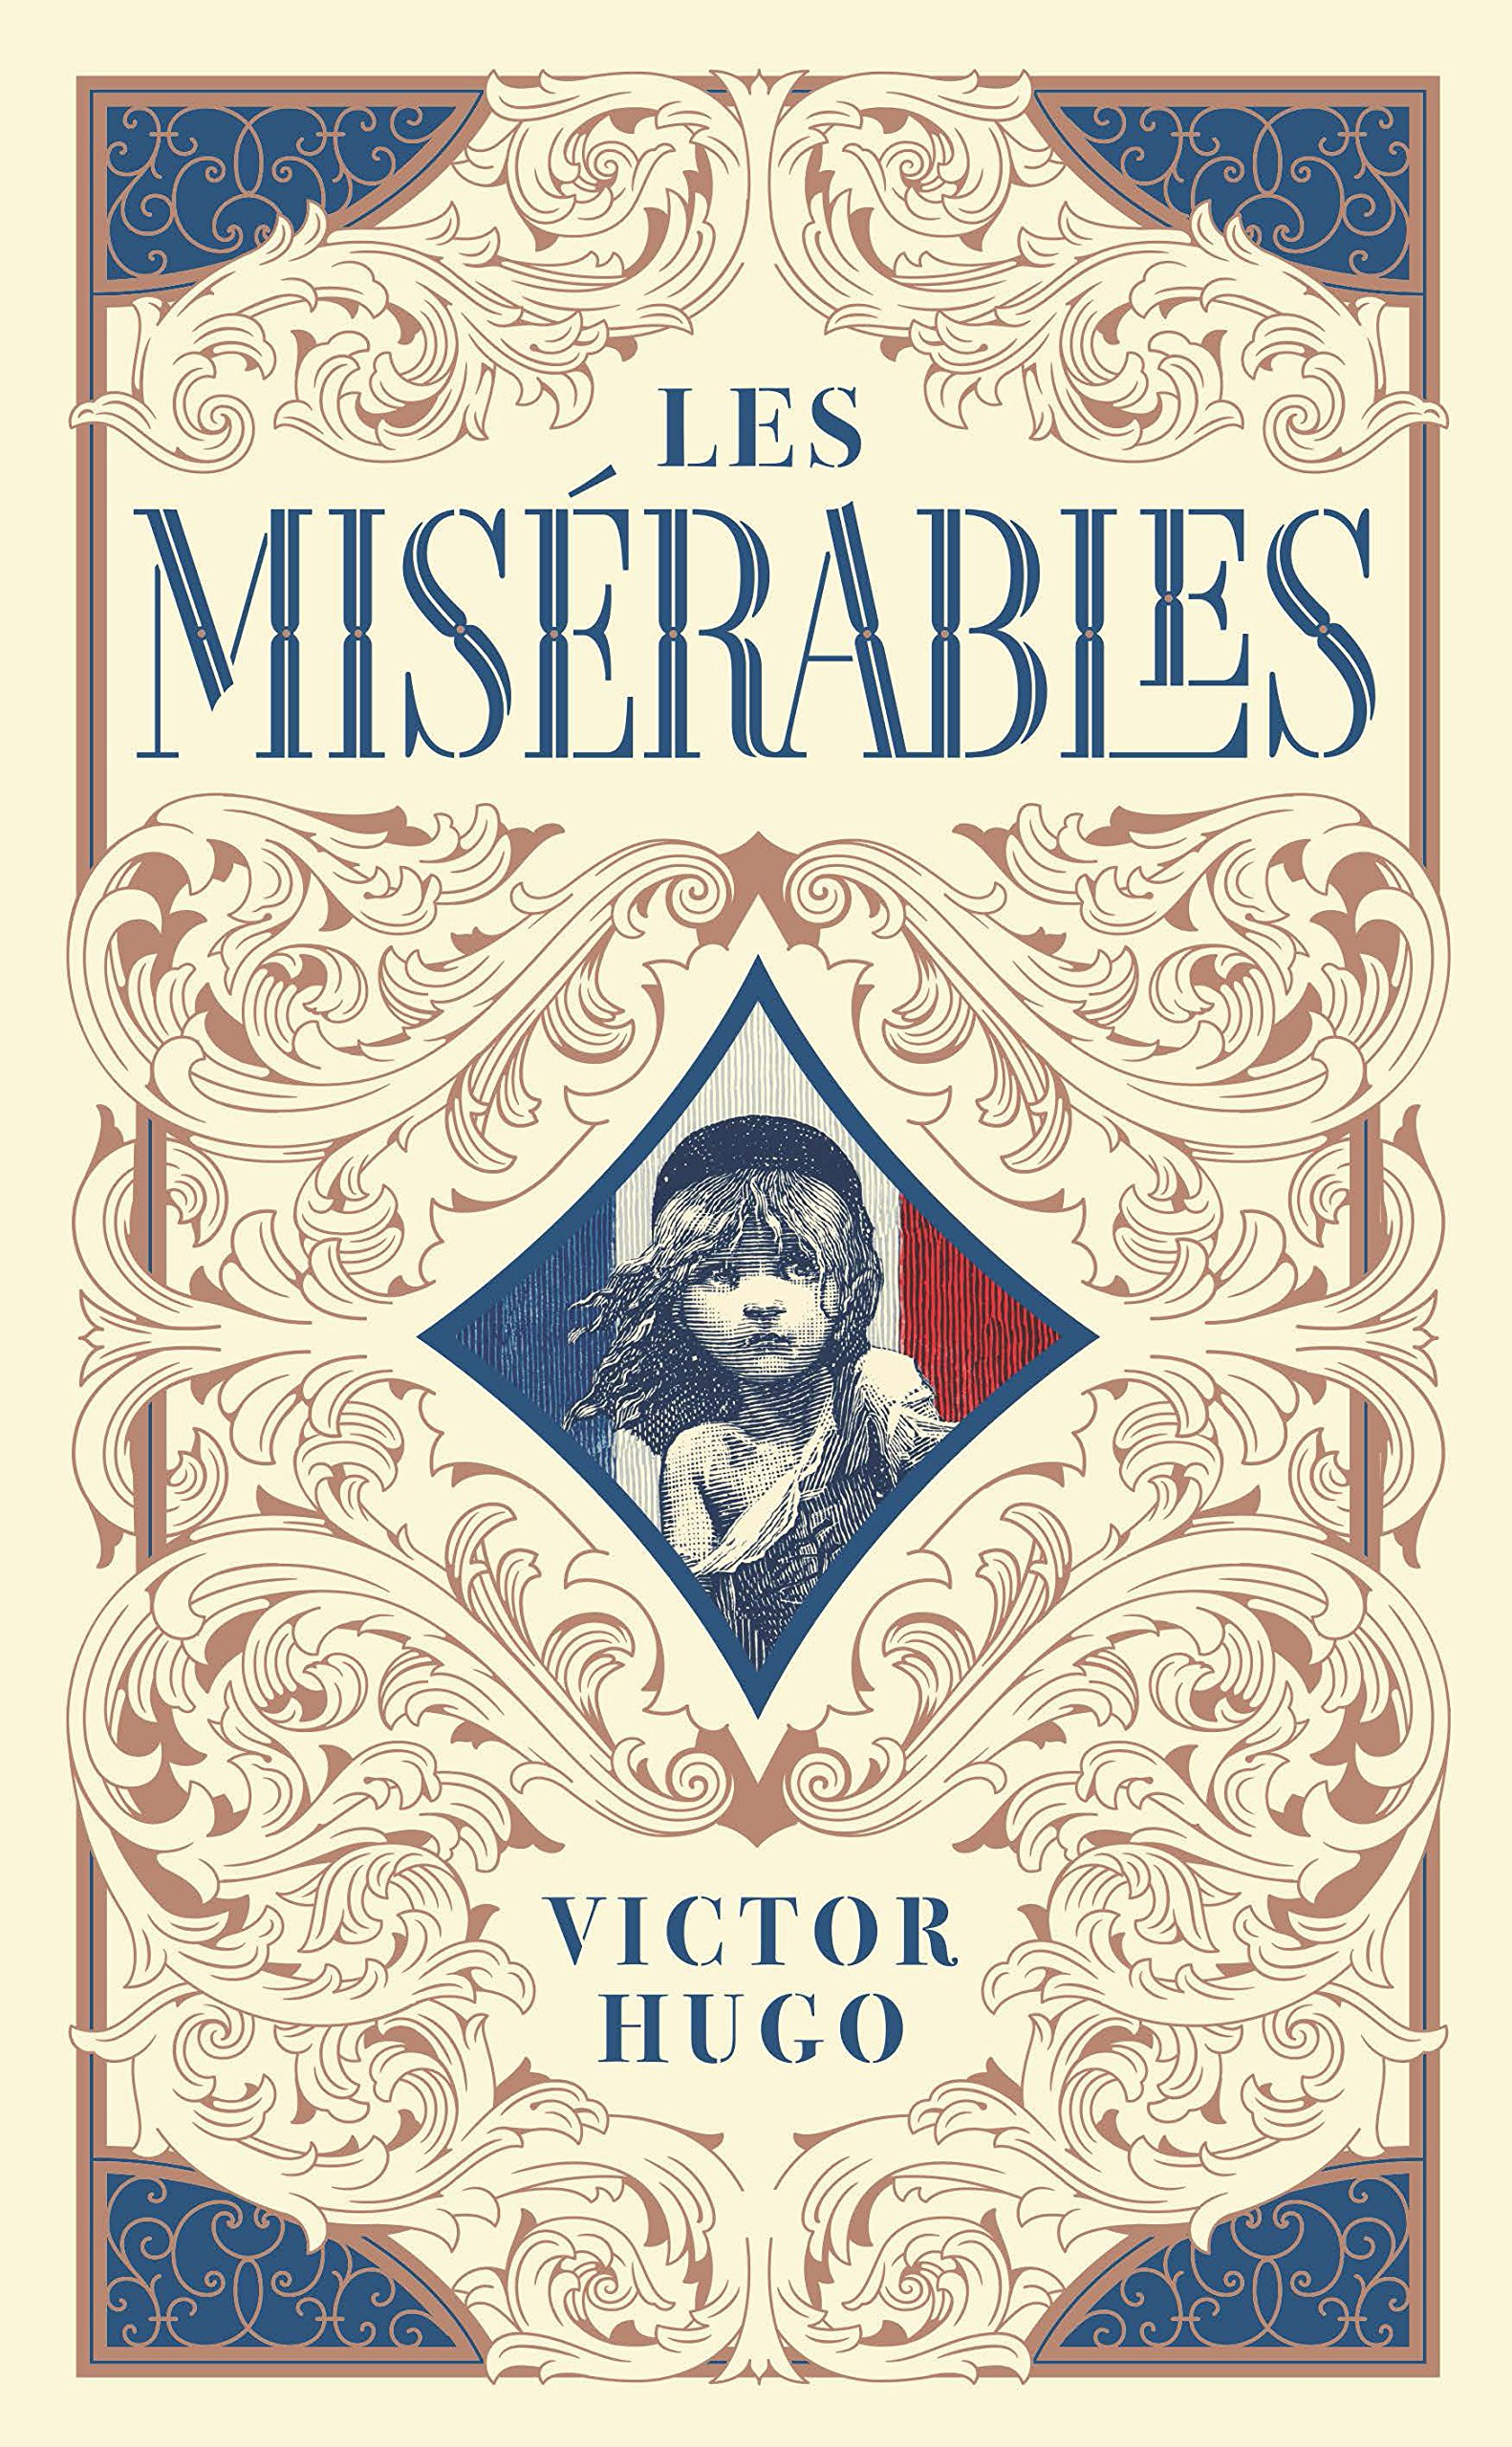 Les Miserables (Barnes & Noble Collectible Editions): Amazon.co.uk ...